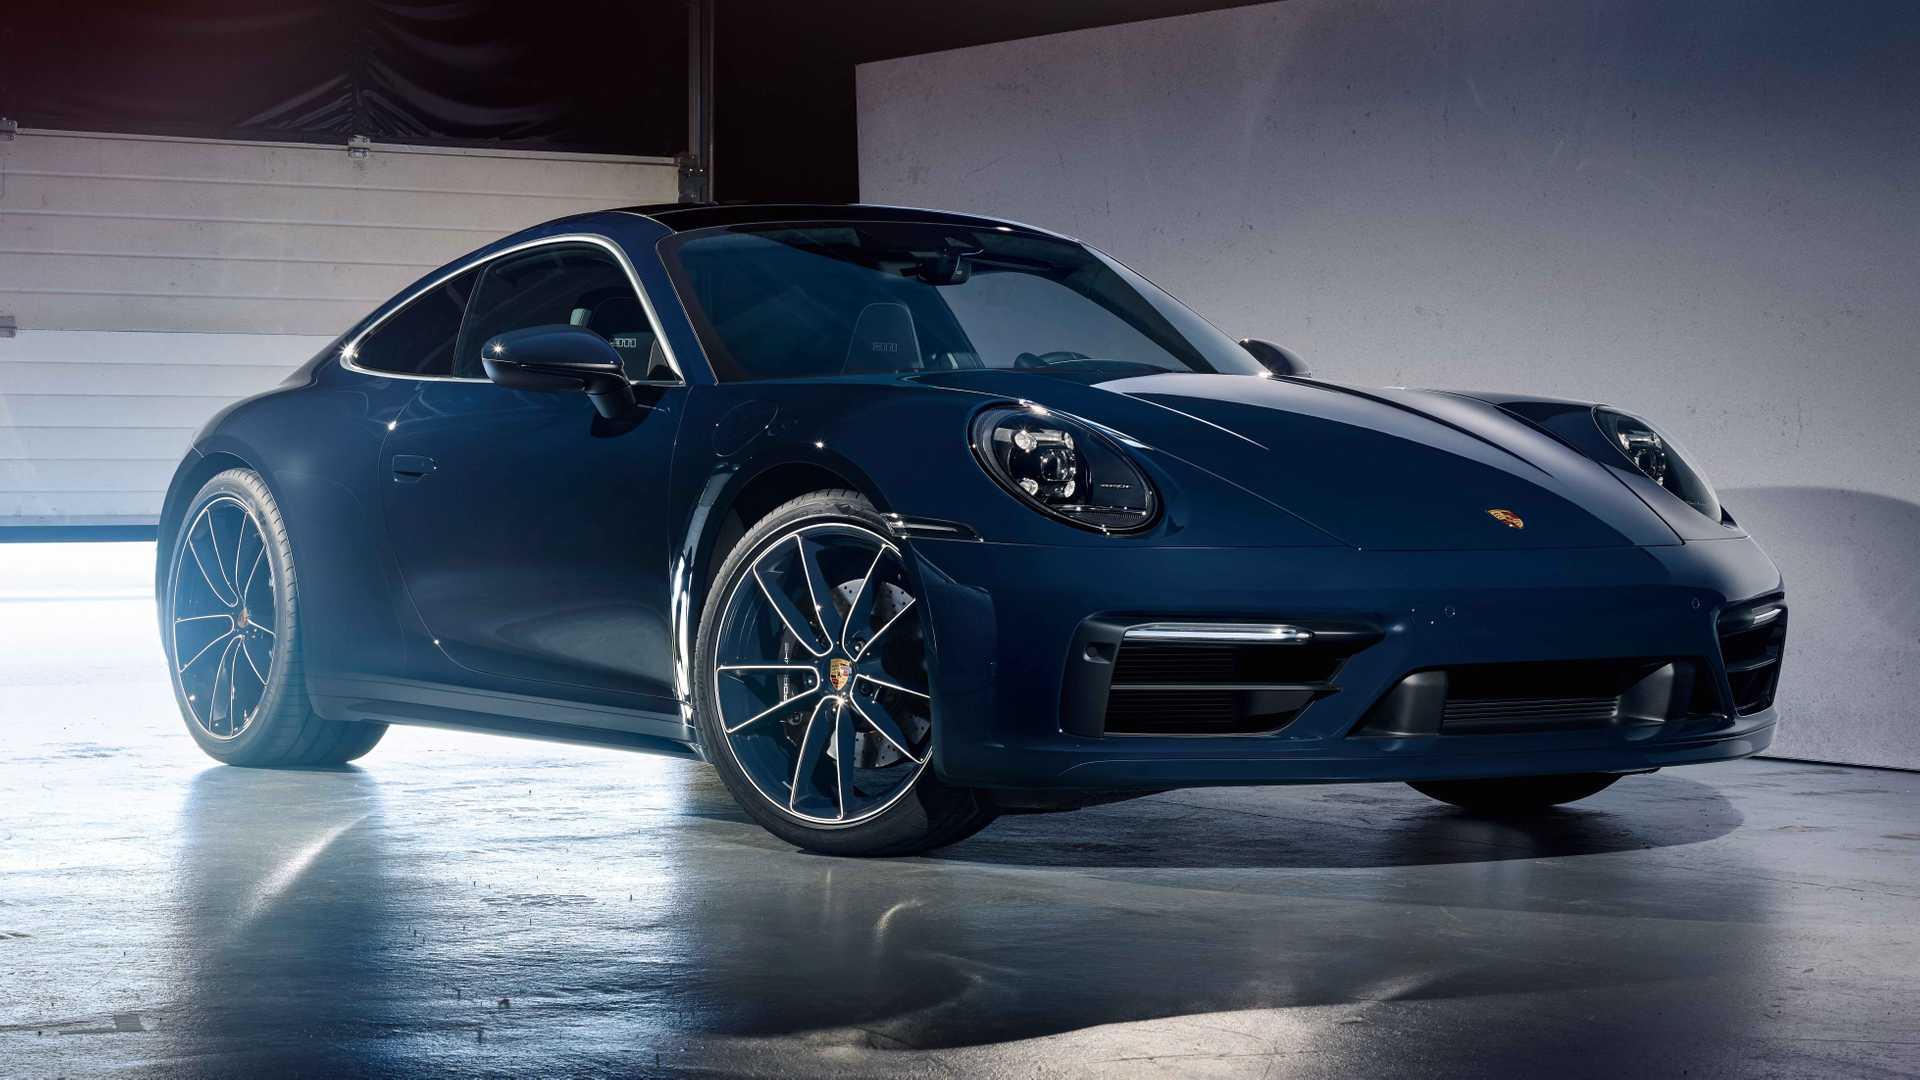 Ra mắt Porsche 911 phiên bản đặc biệt Belgian Legend - 2